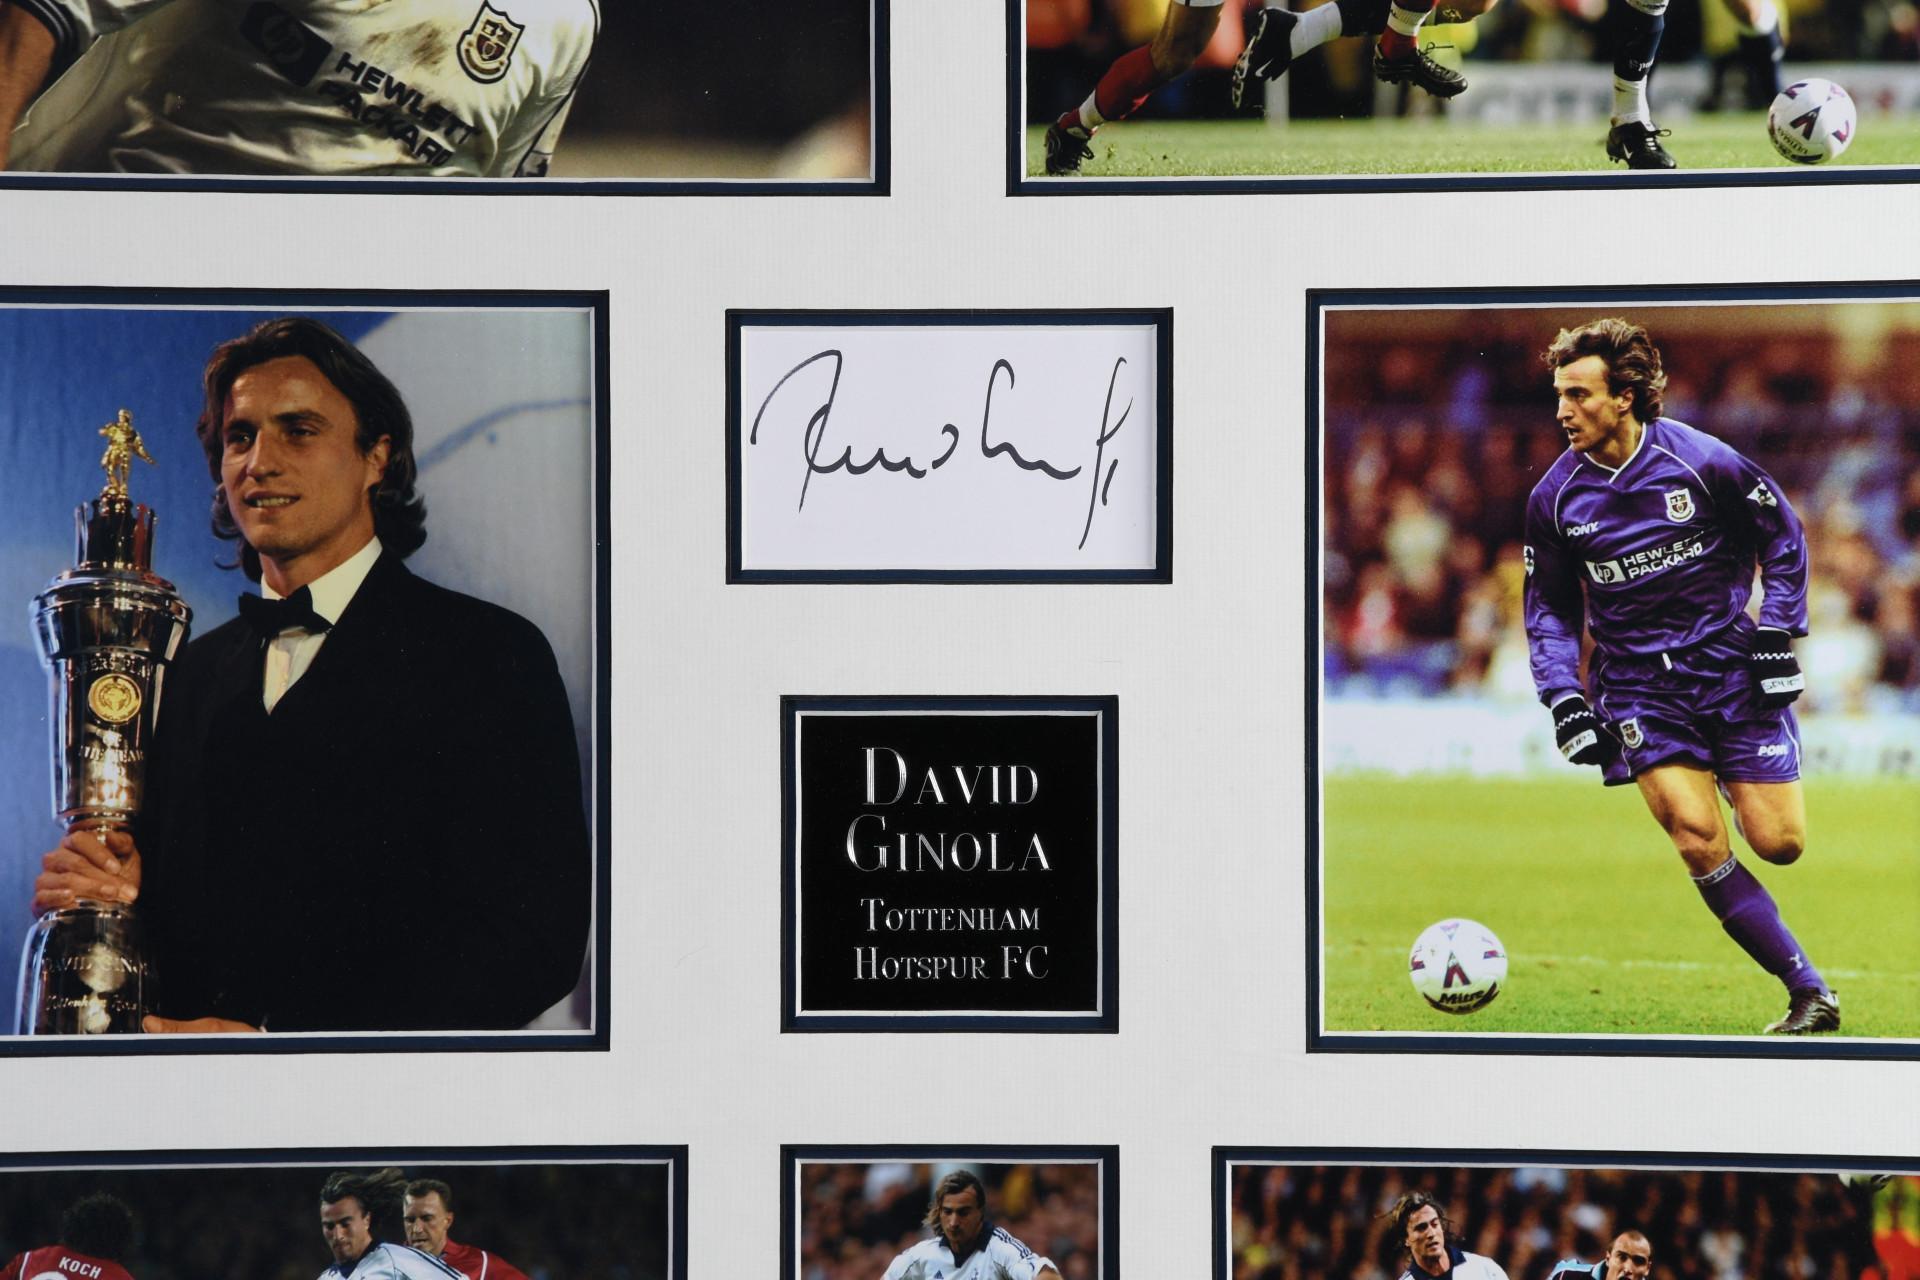 David Ginola Memorabilia